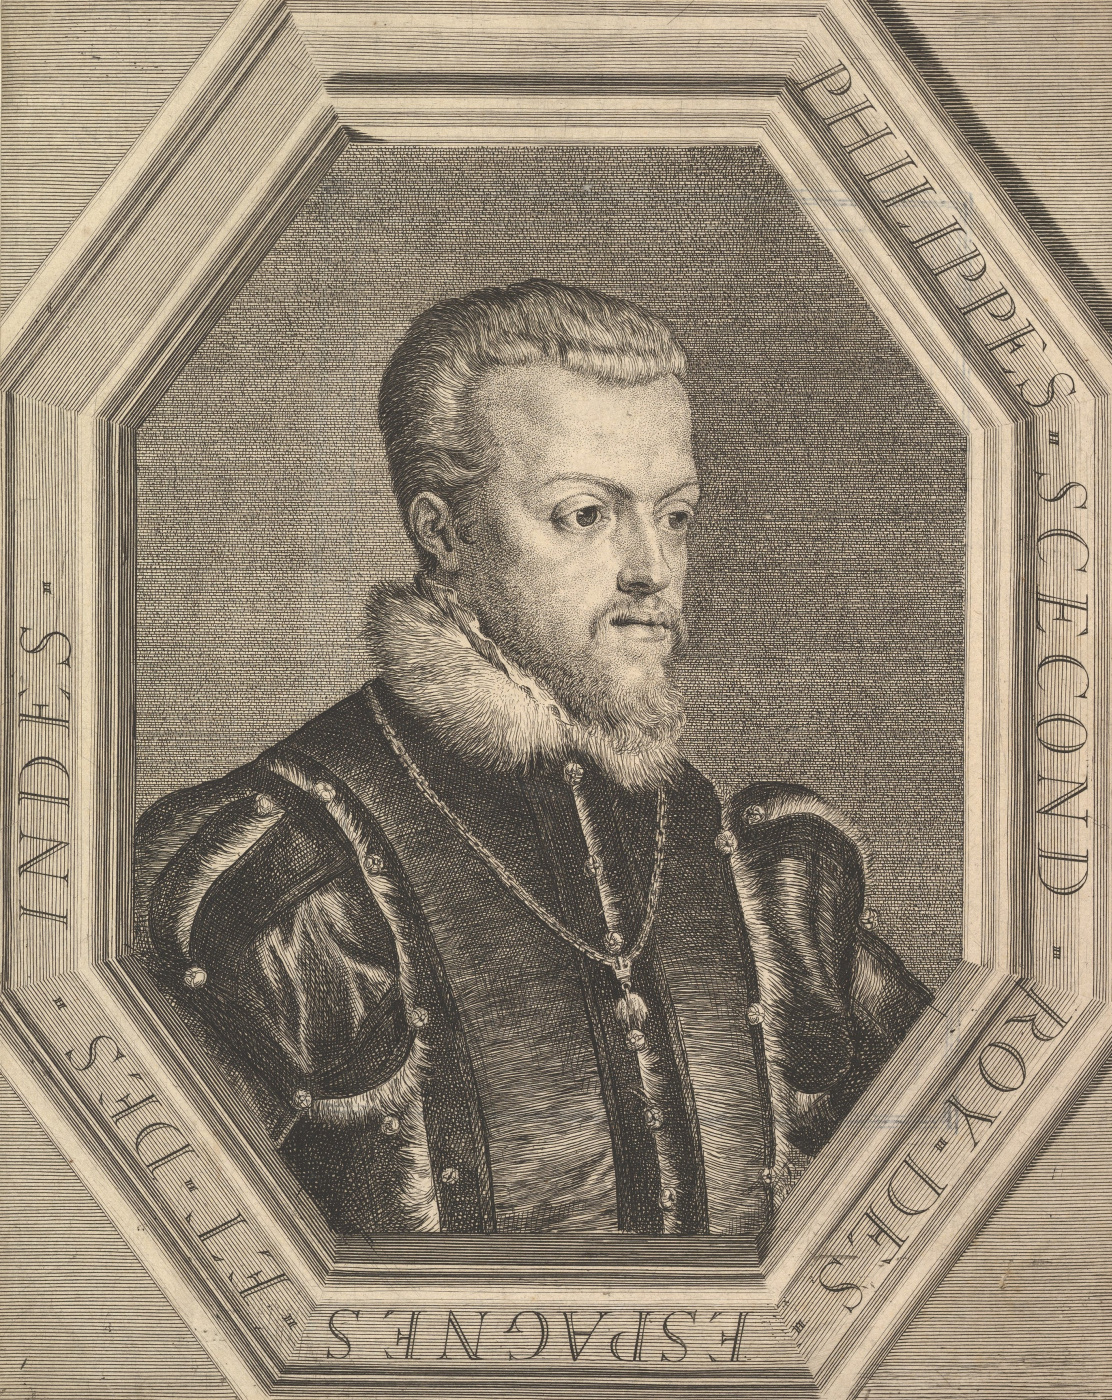 Titian Vecelli. Philippe II, roi d'Espagne